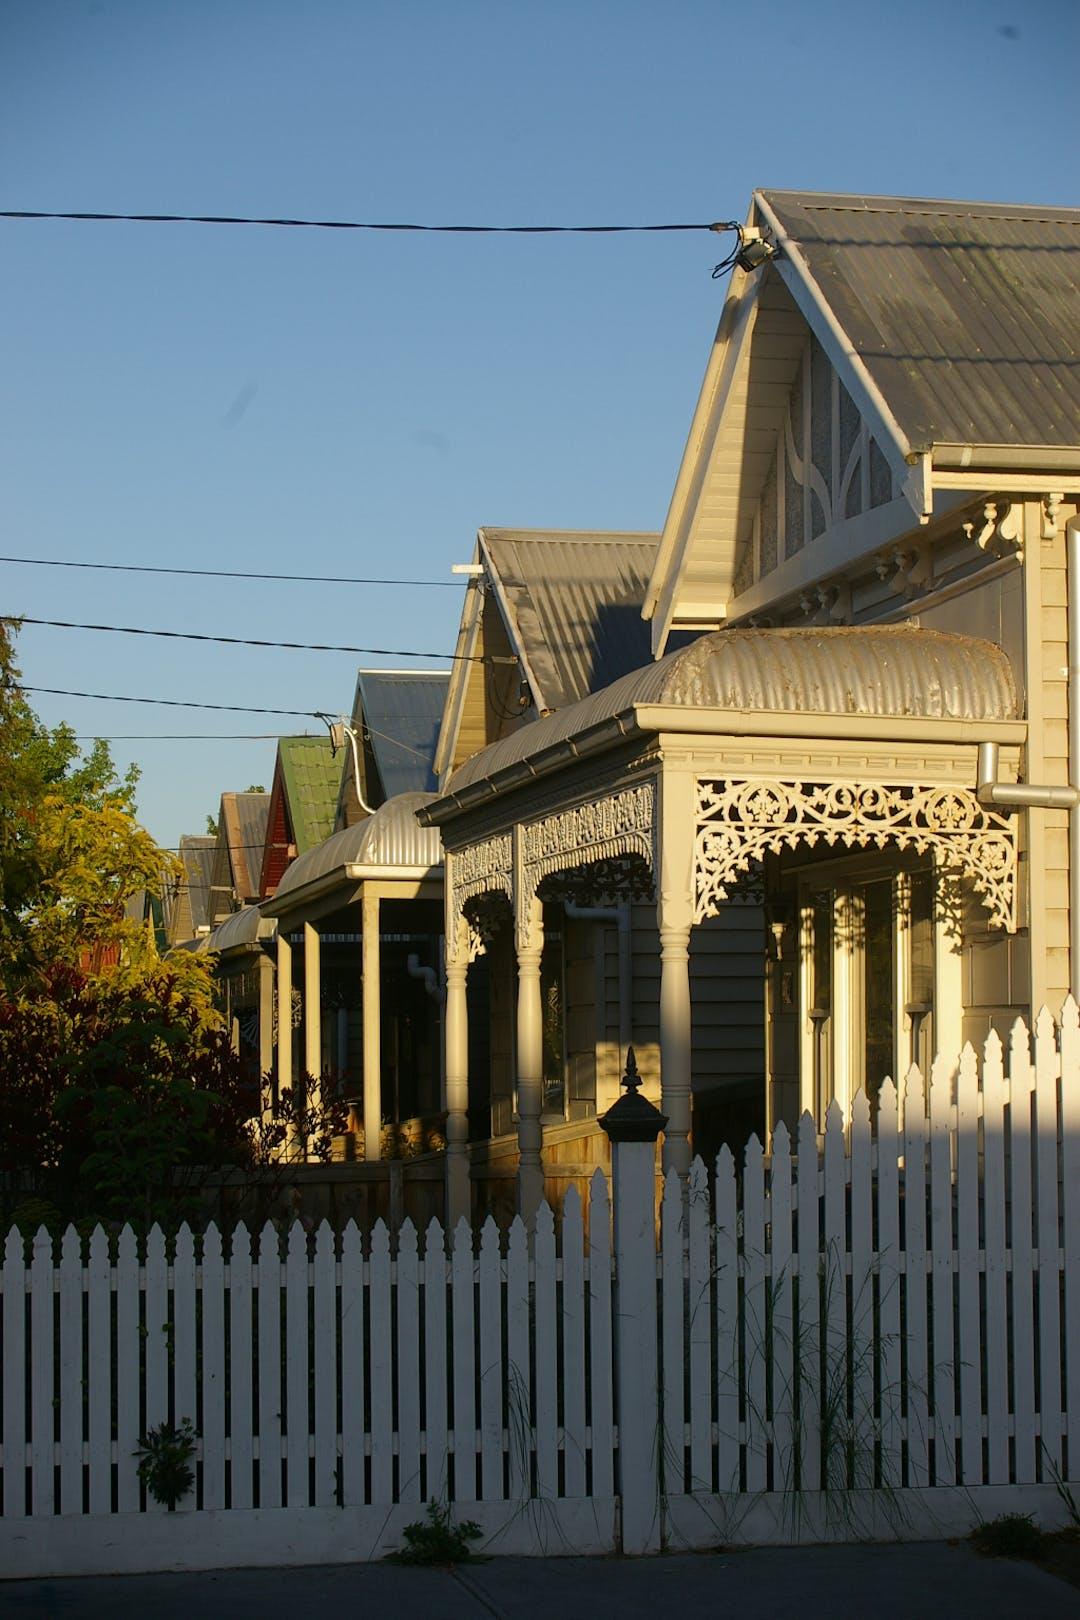 Ofarrell street